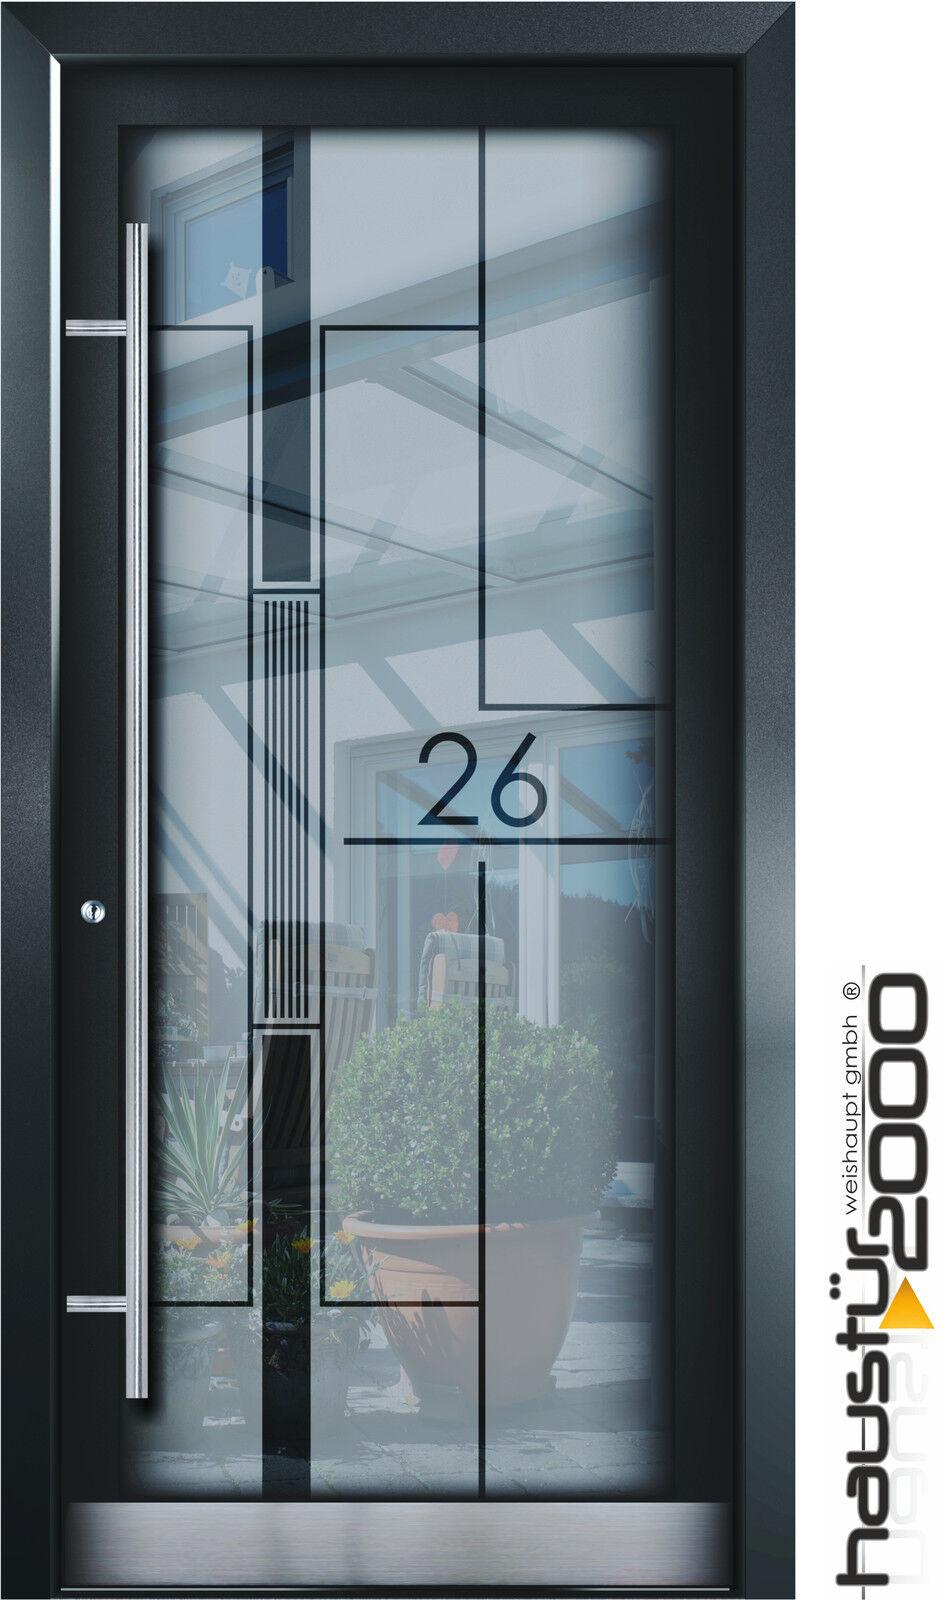 Haustür glas  Aluminium Haustür Glas Tür Alu Haustüren nach Maß Mod. HT 5479.1 ...